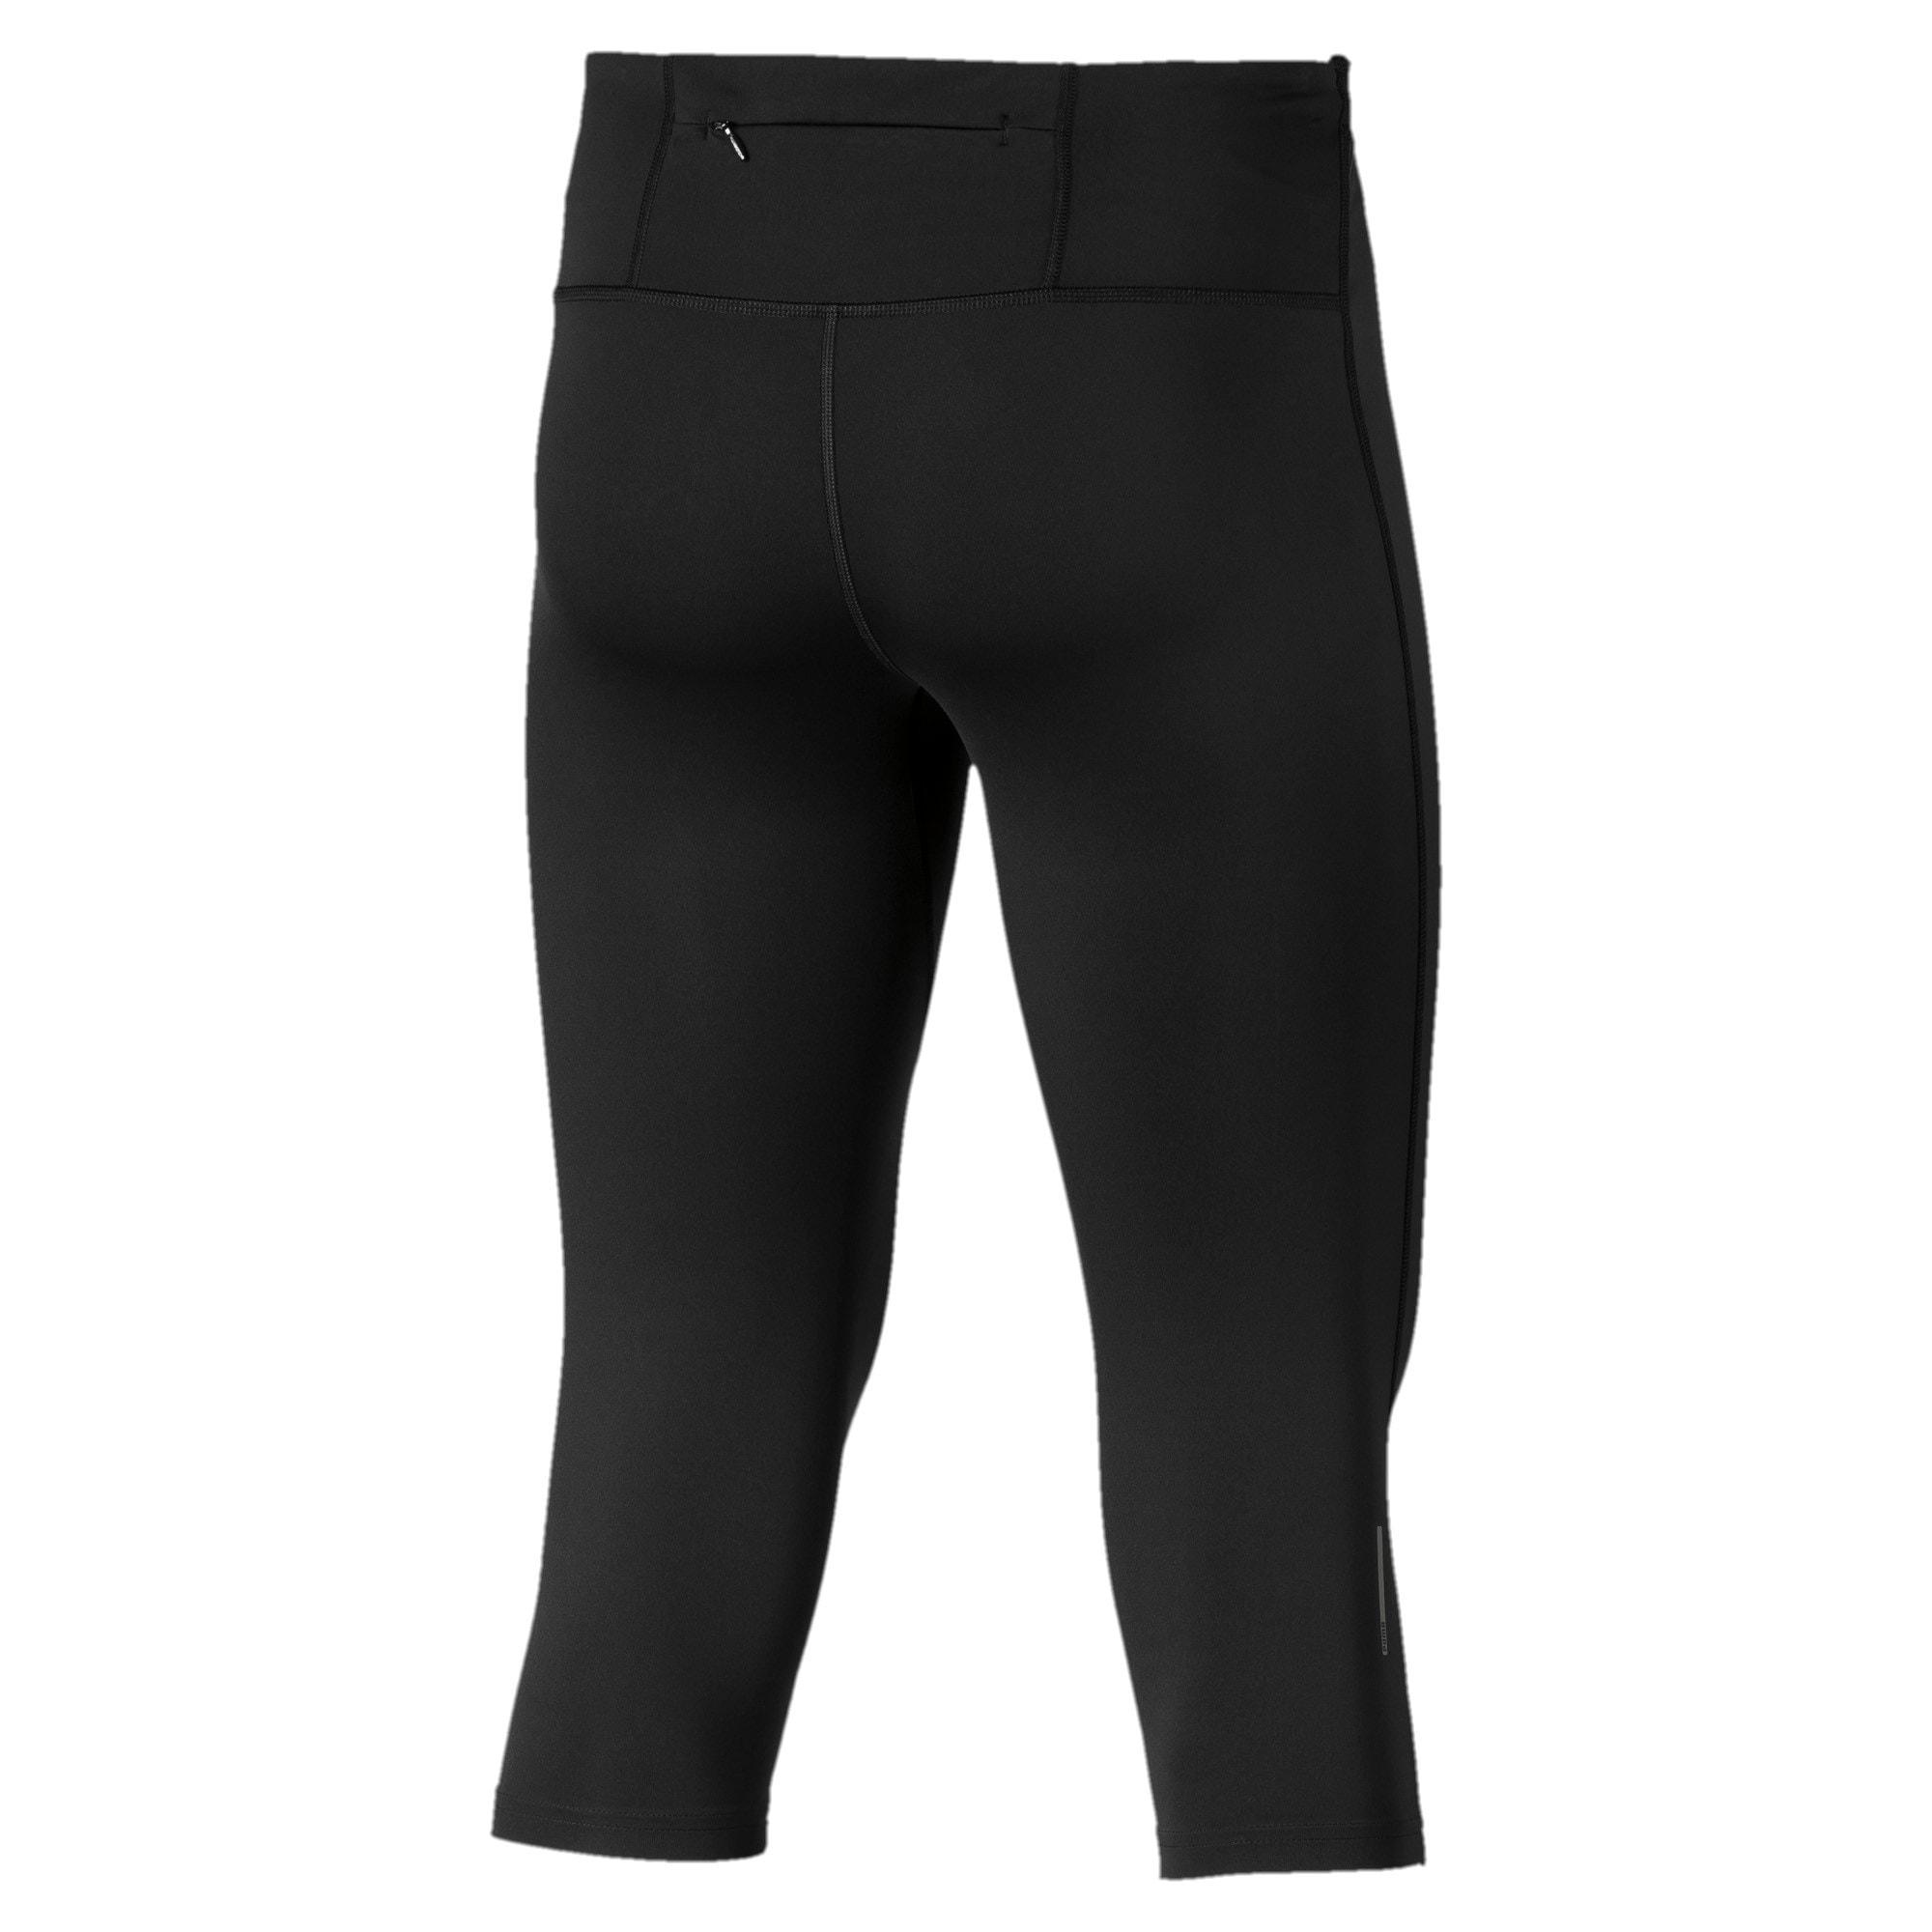 Thumbnail 5 of Pantalon de course IGNITE Running 3/4 pour femme, Puma Black, medium